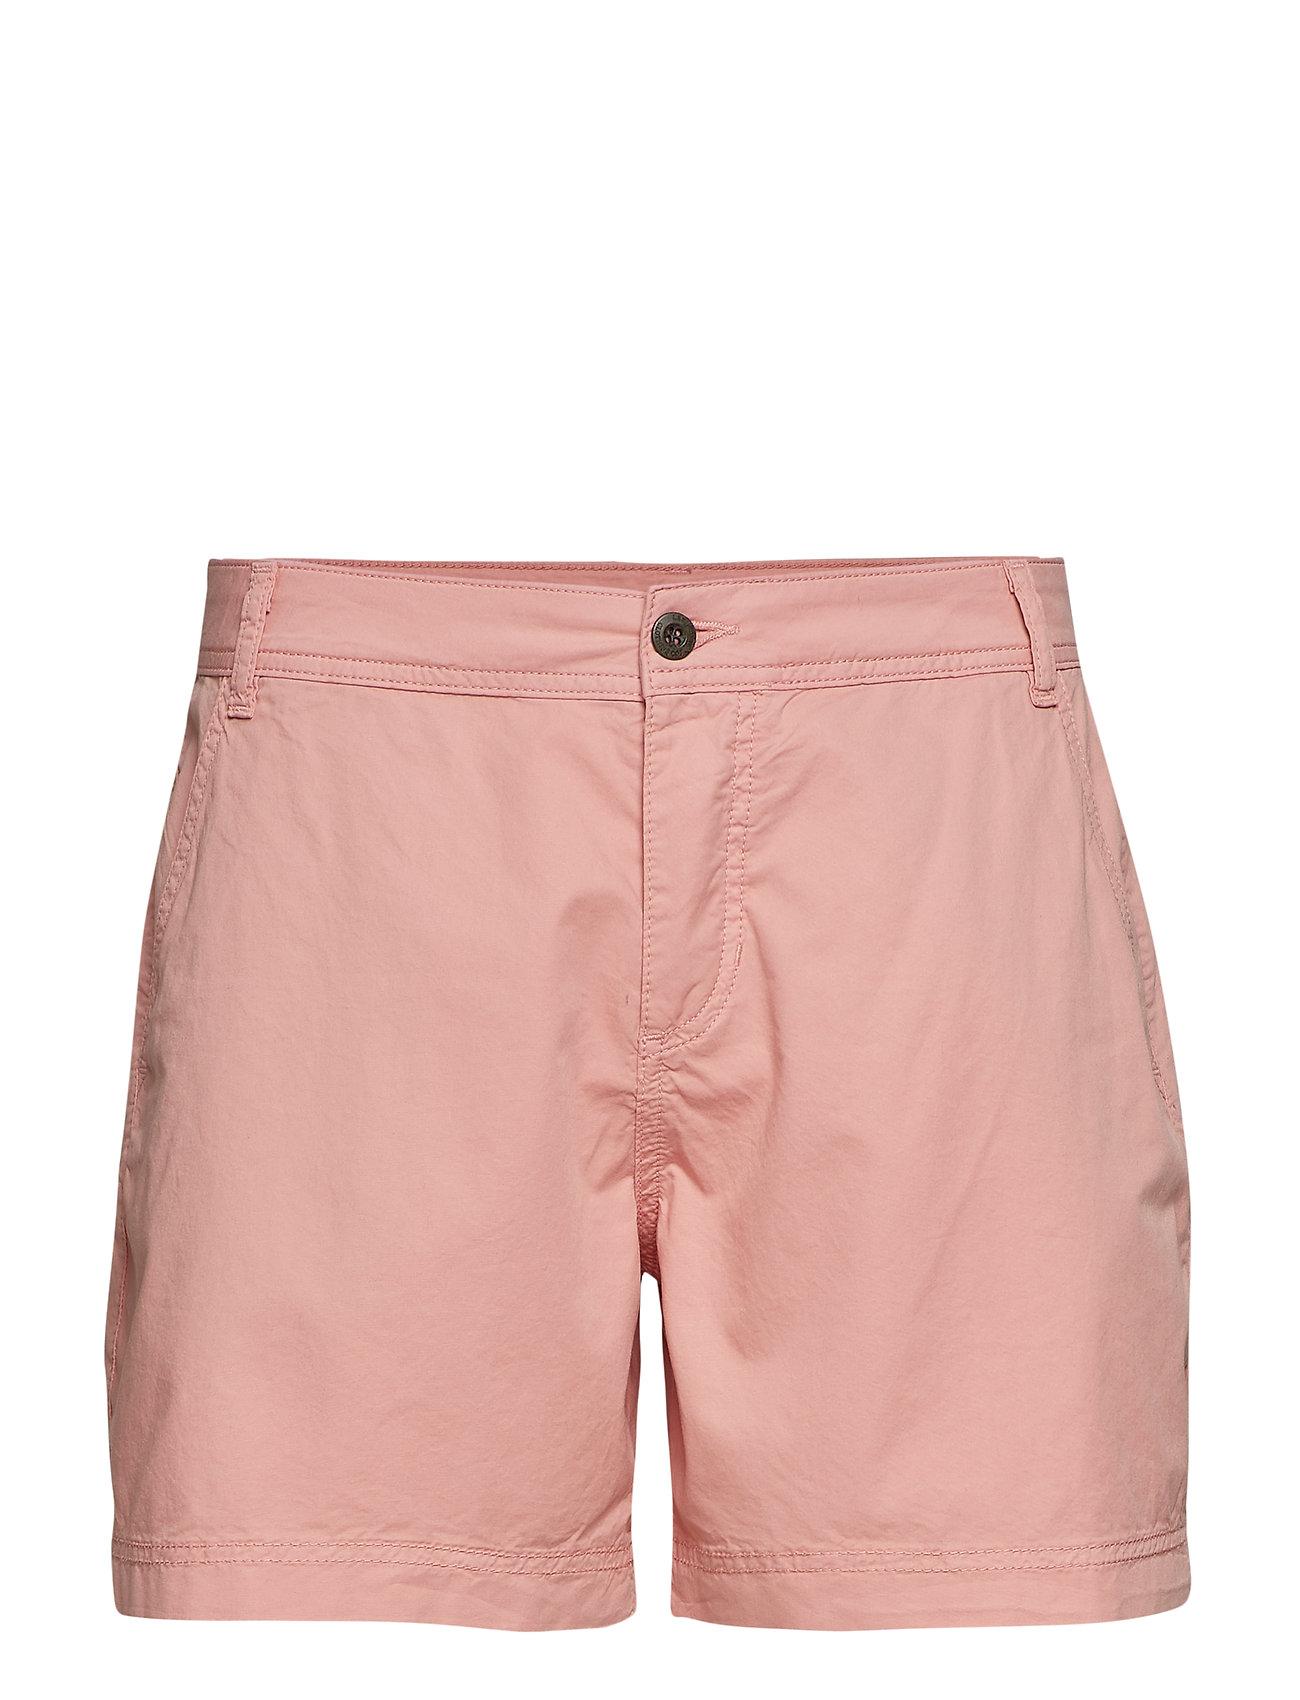 Lexington Clothing Gail Shorts